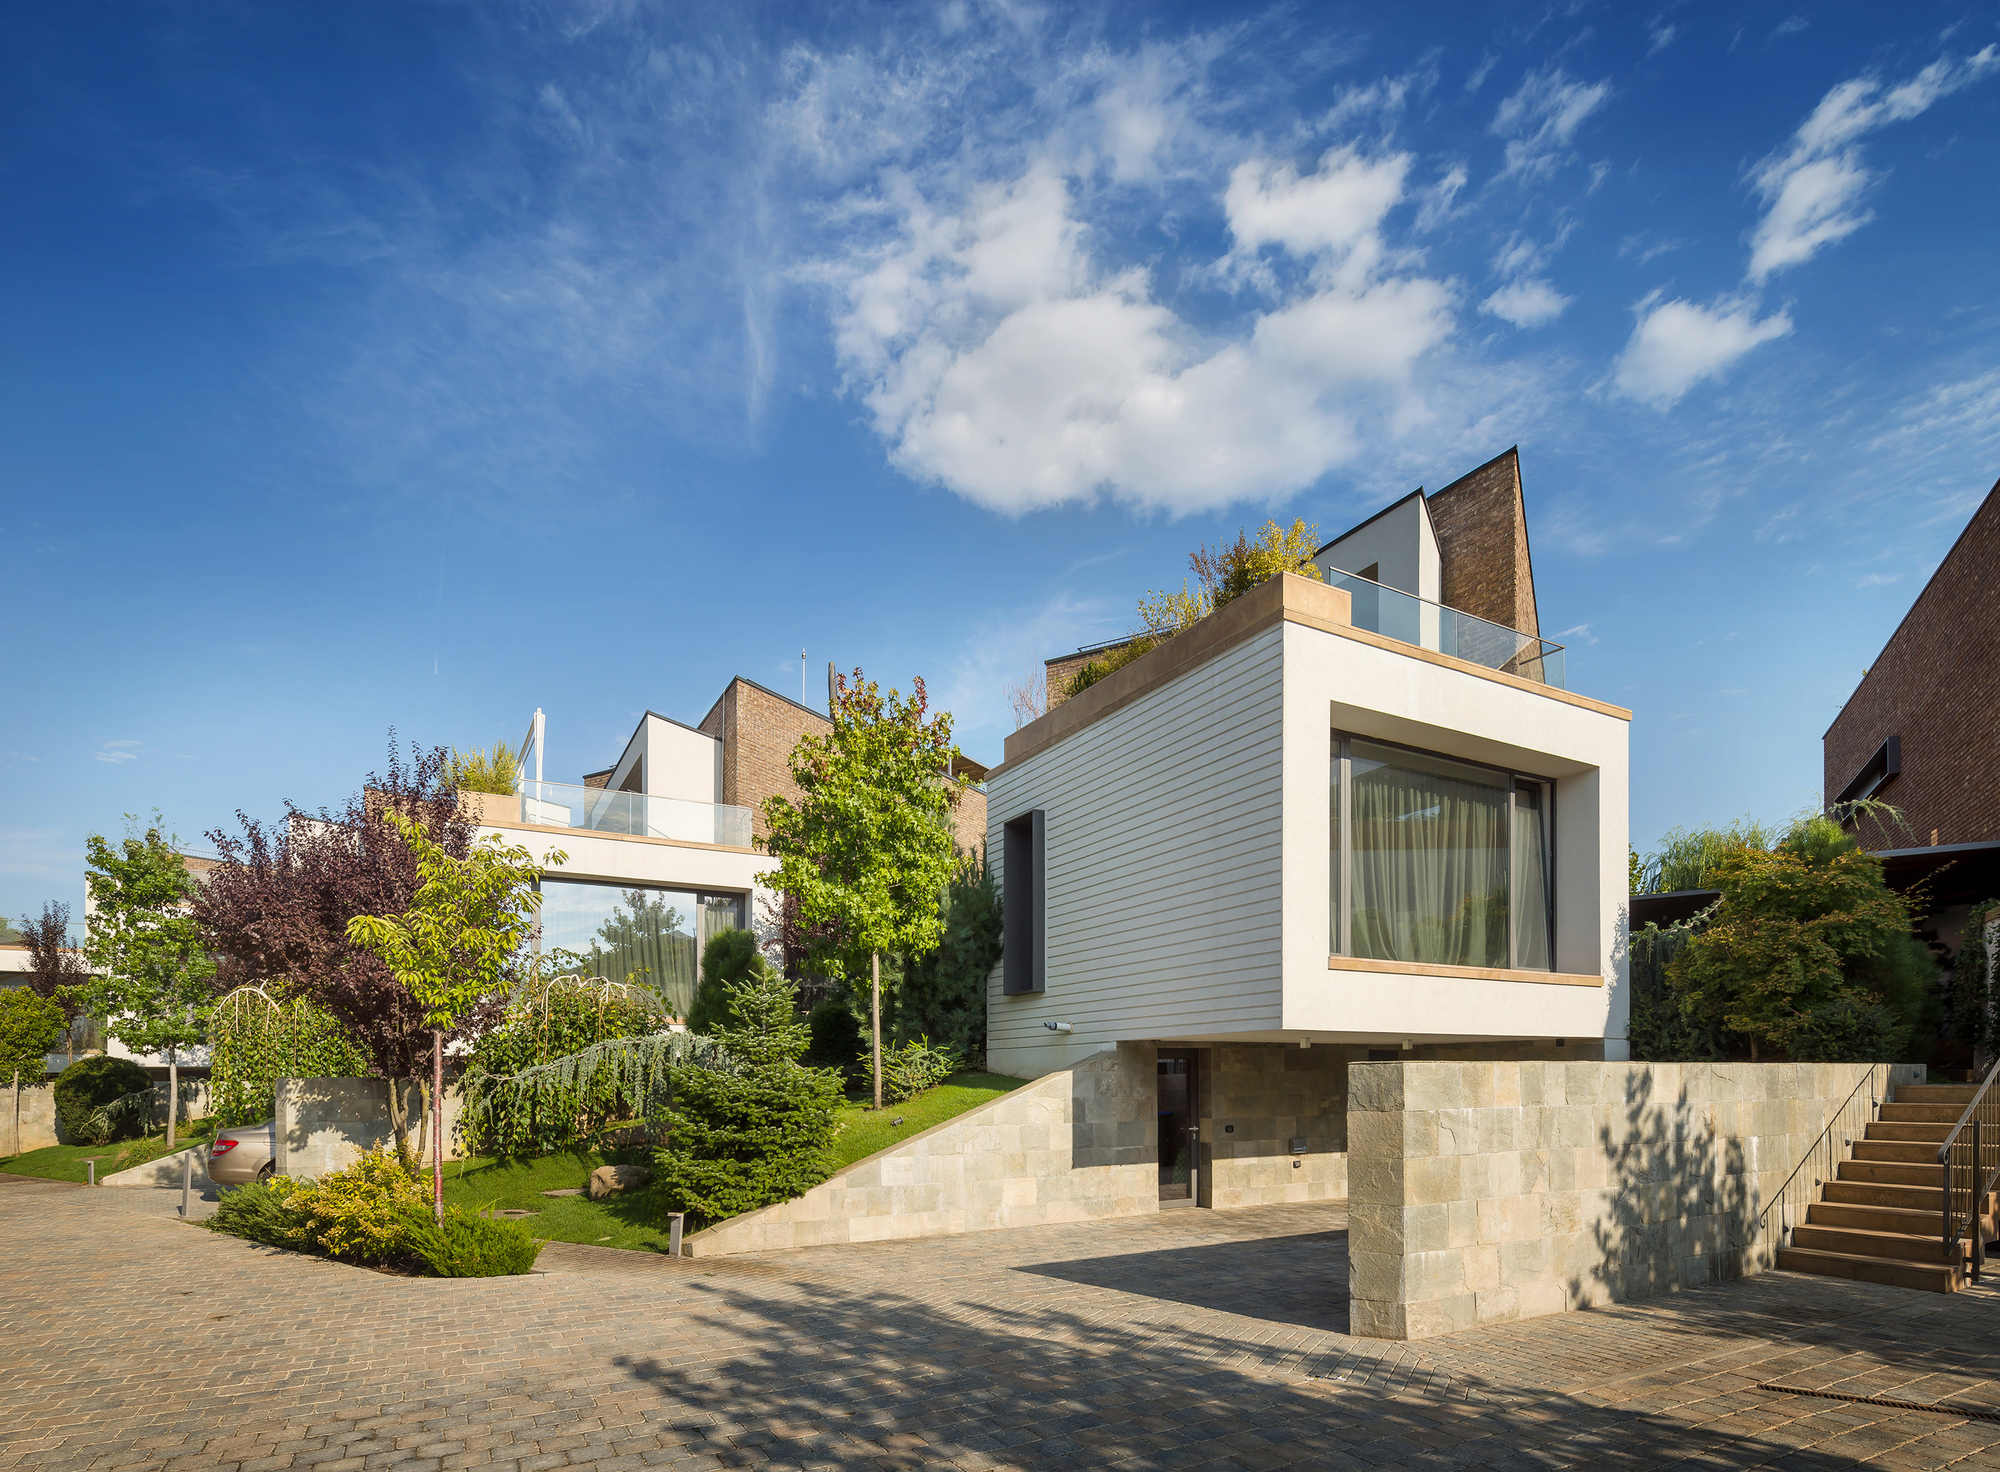 Evening On The Hill / Fabrica De Arhitectura